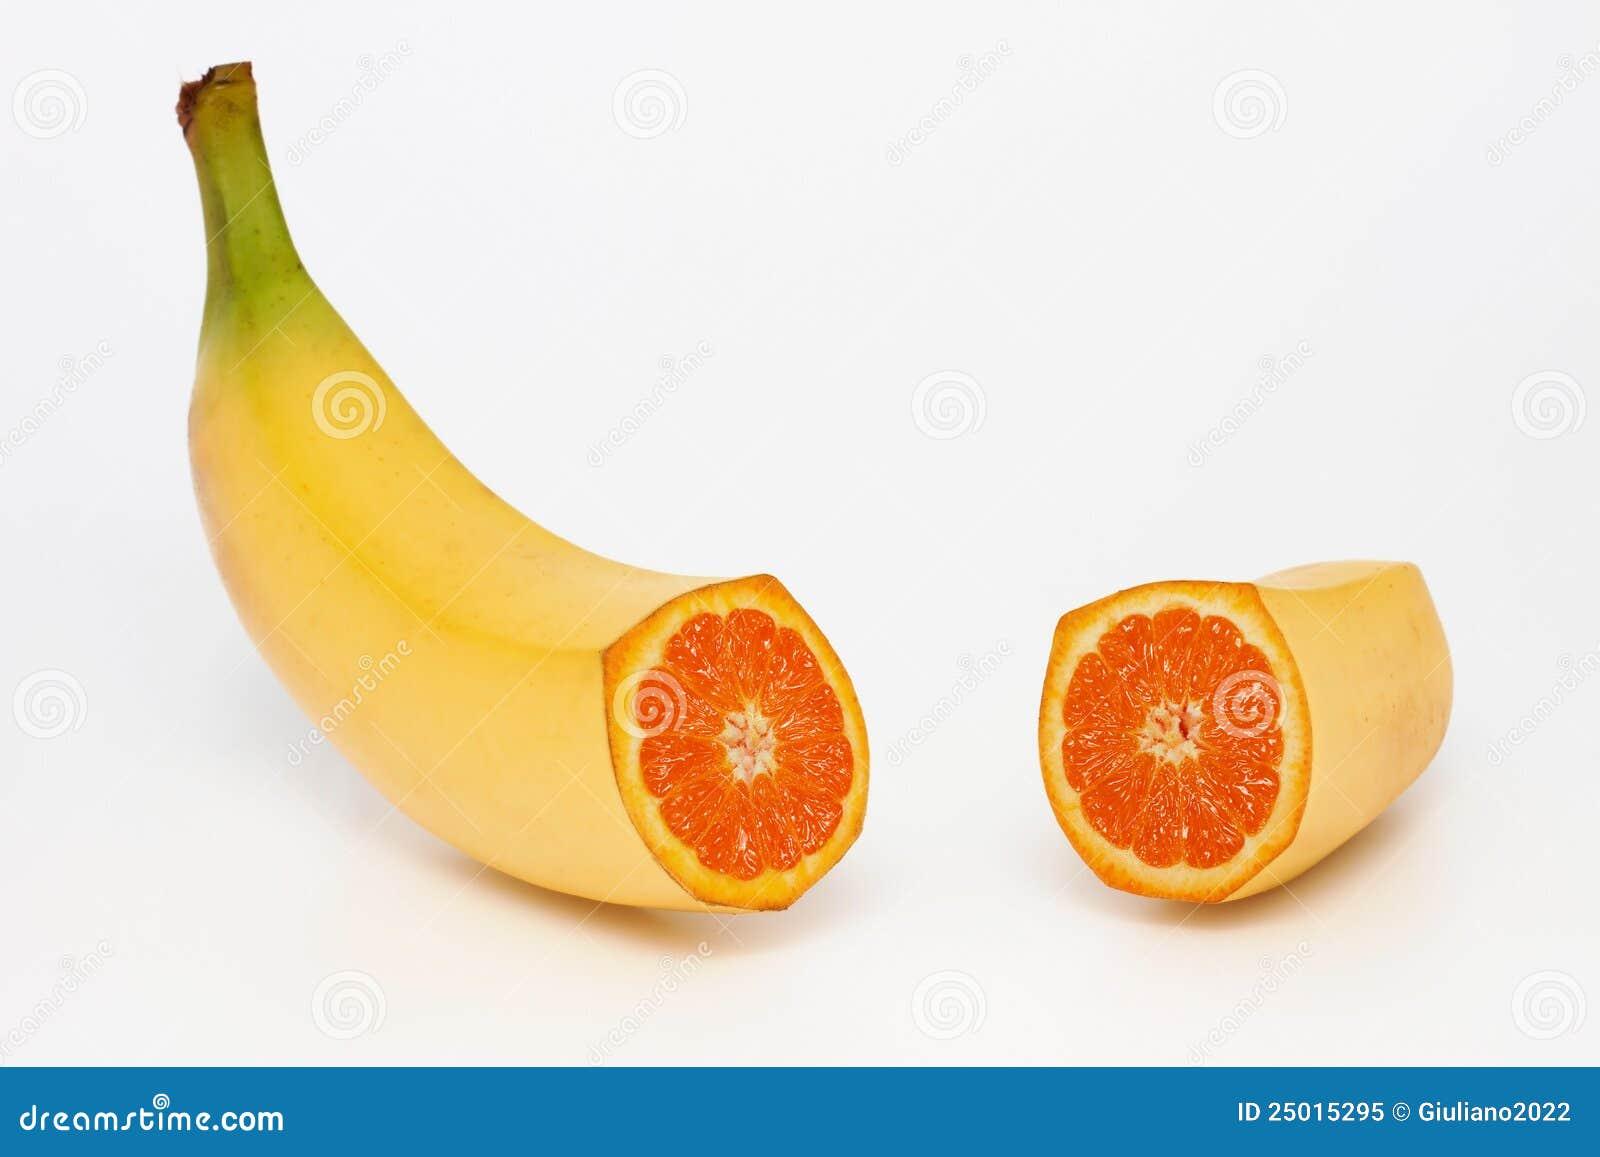 Banaan die een sinaasappel bevat